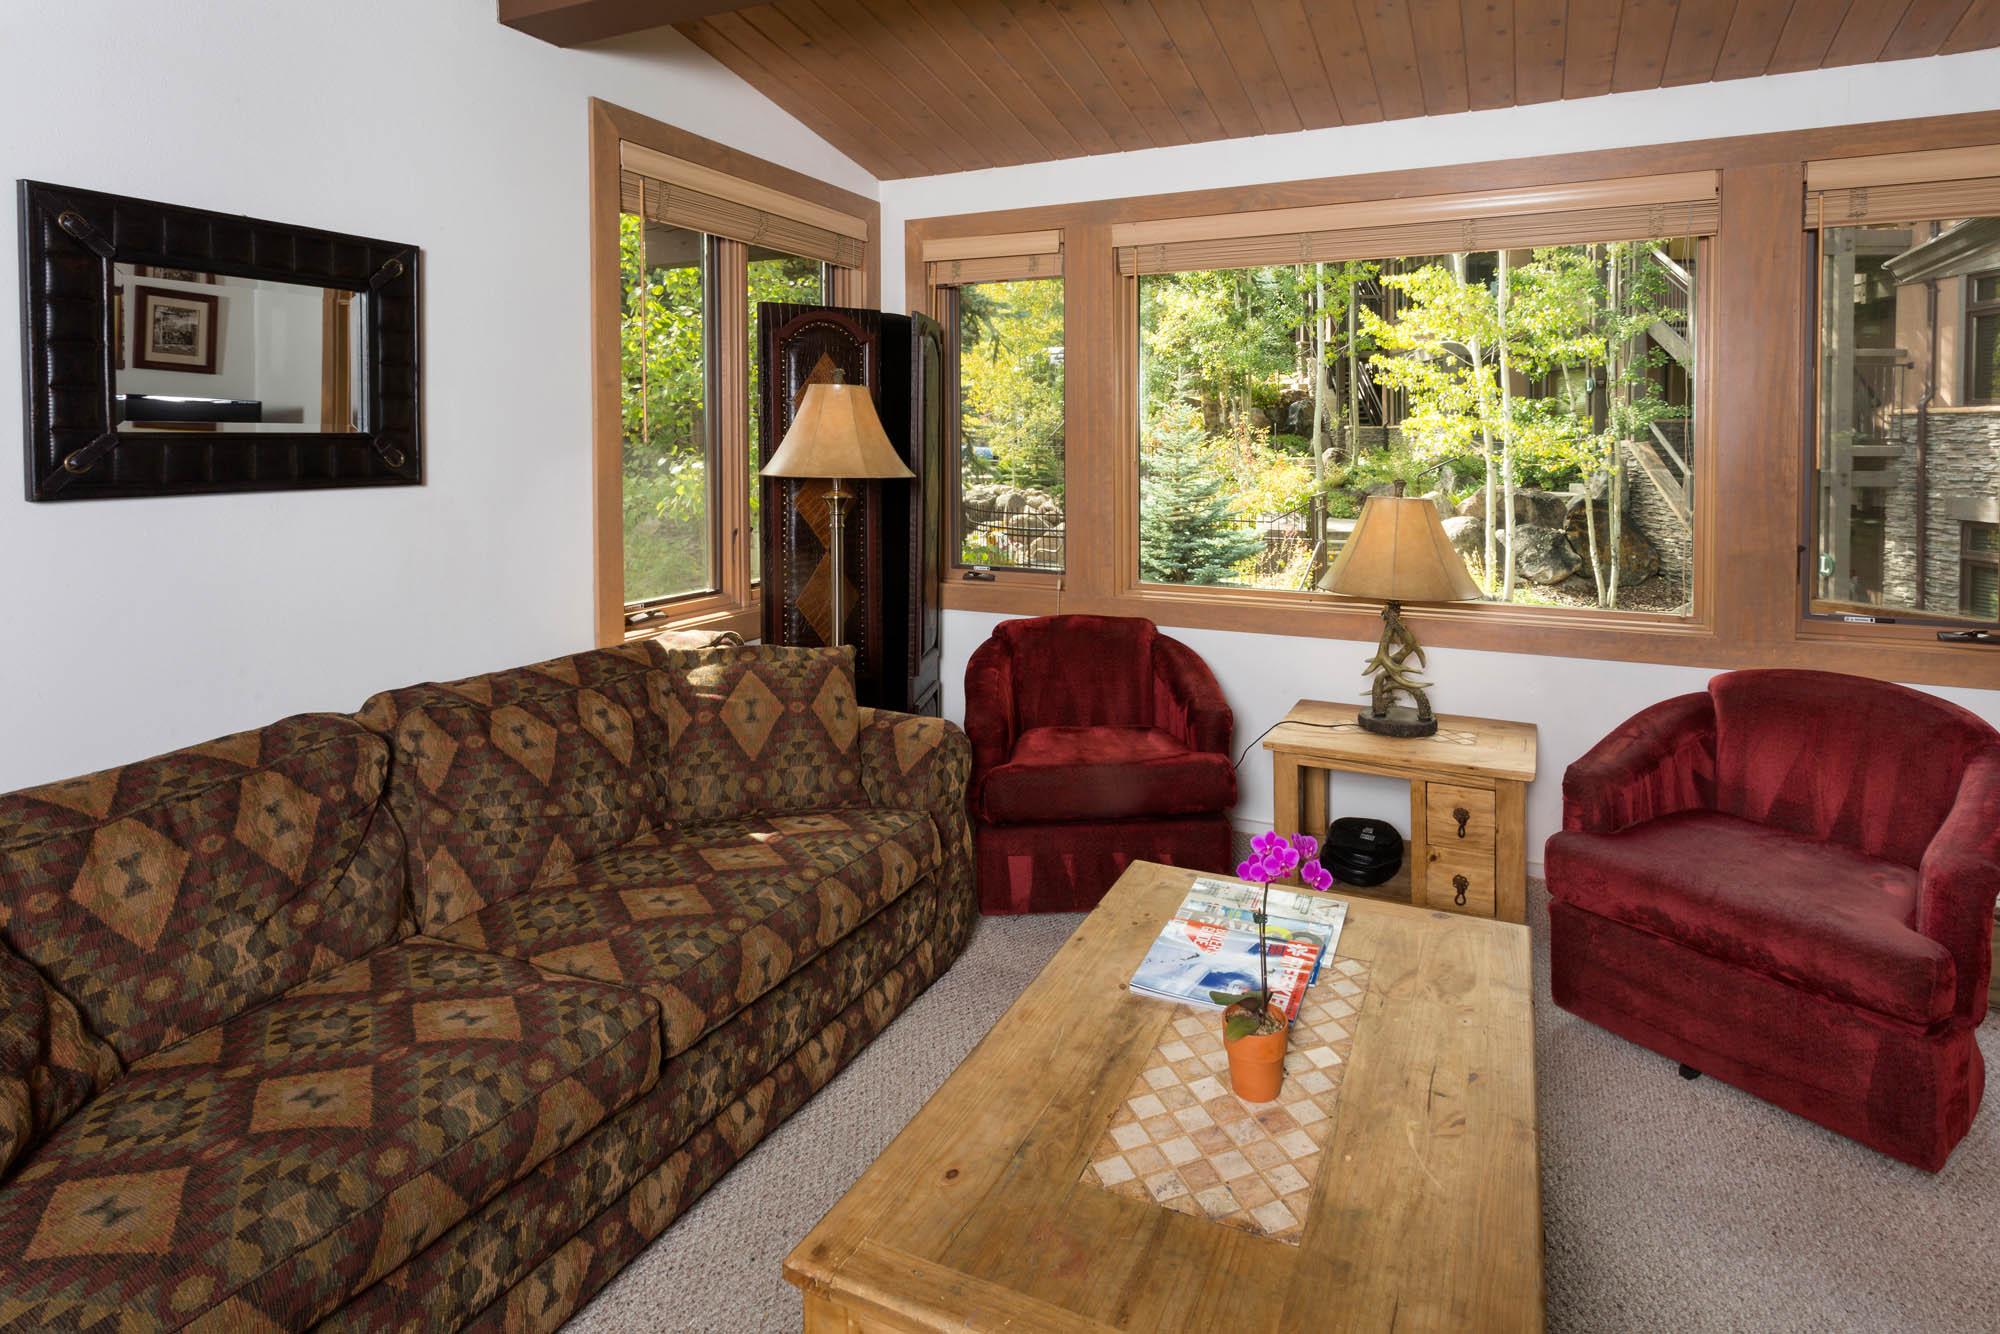 Condominium for Sale at Aspenwood Unit K-20 600 Carriage Way Aspenwood K-20 Snowmass Village, Colorado 81615 United States